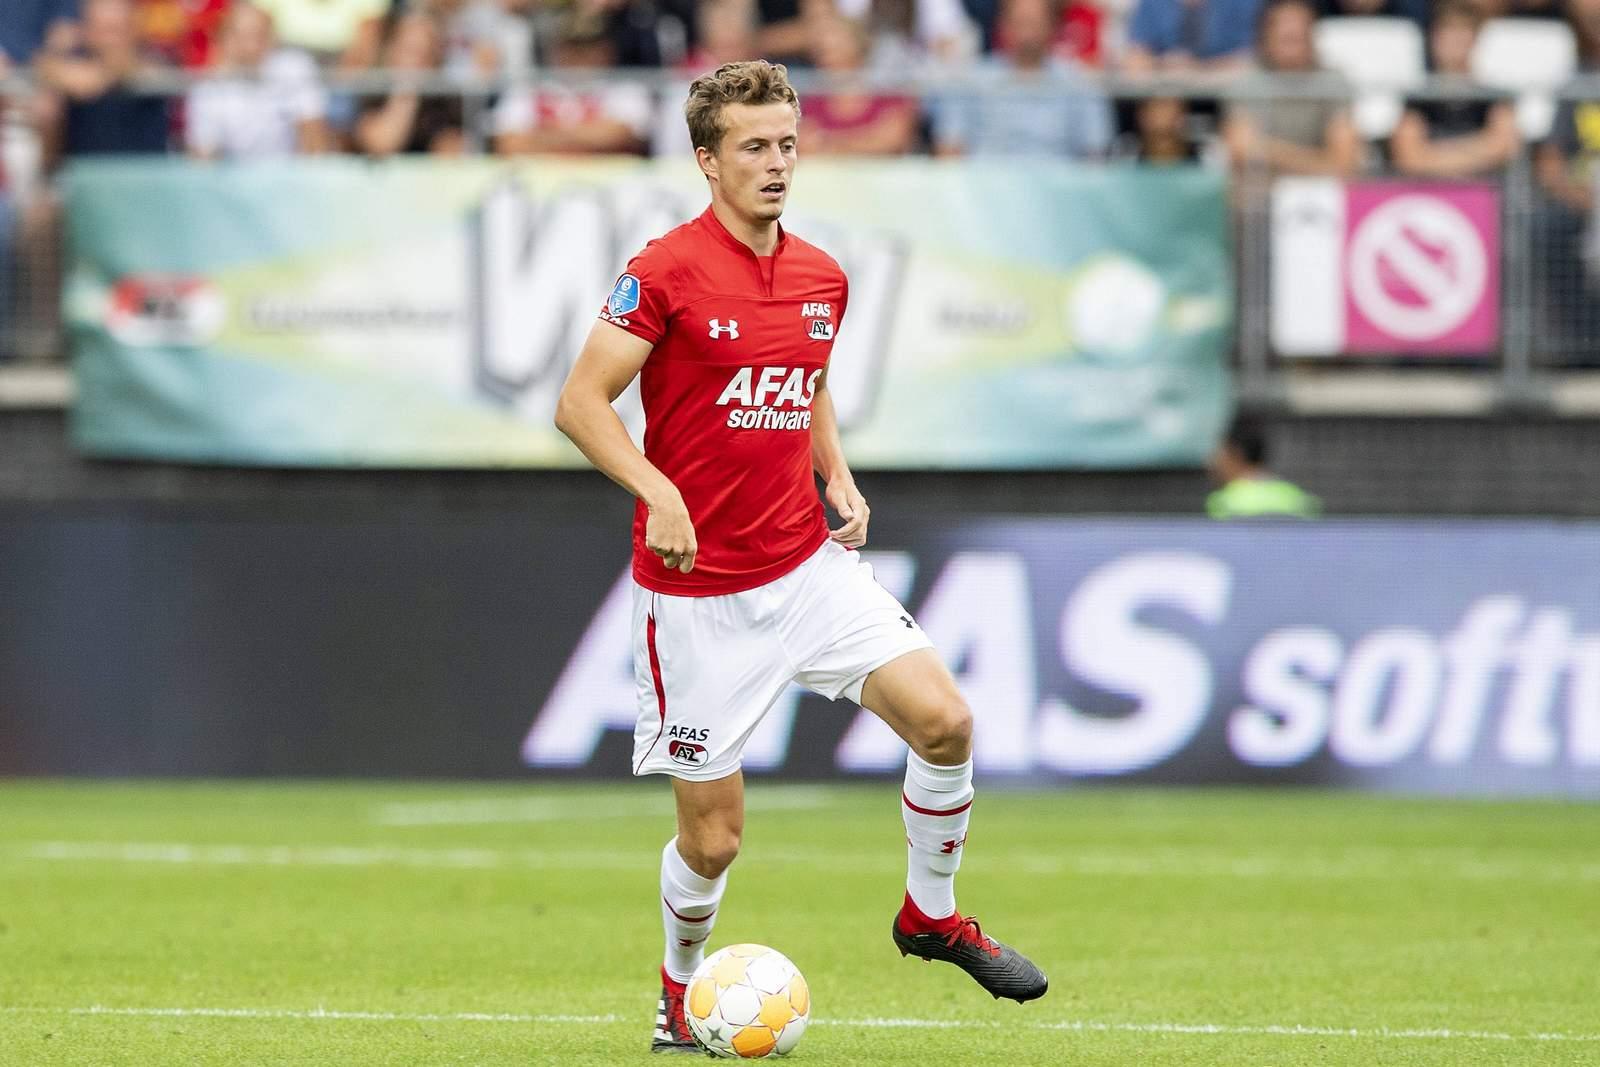 Leon Bergsma von AZ Alkmaar